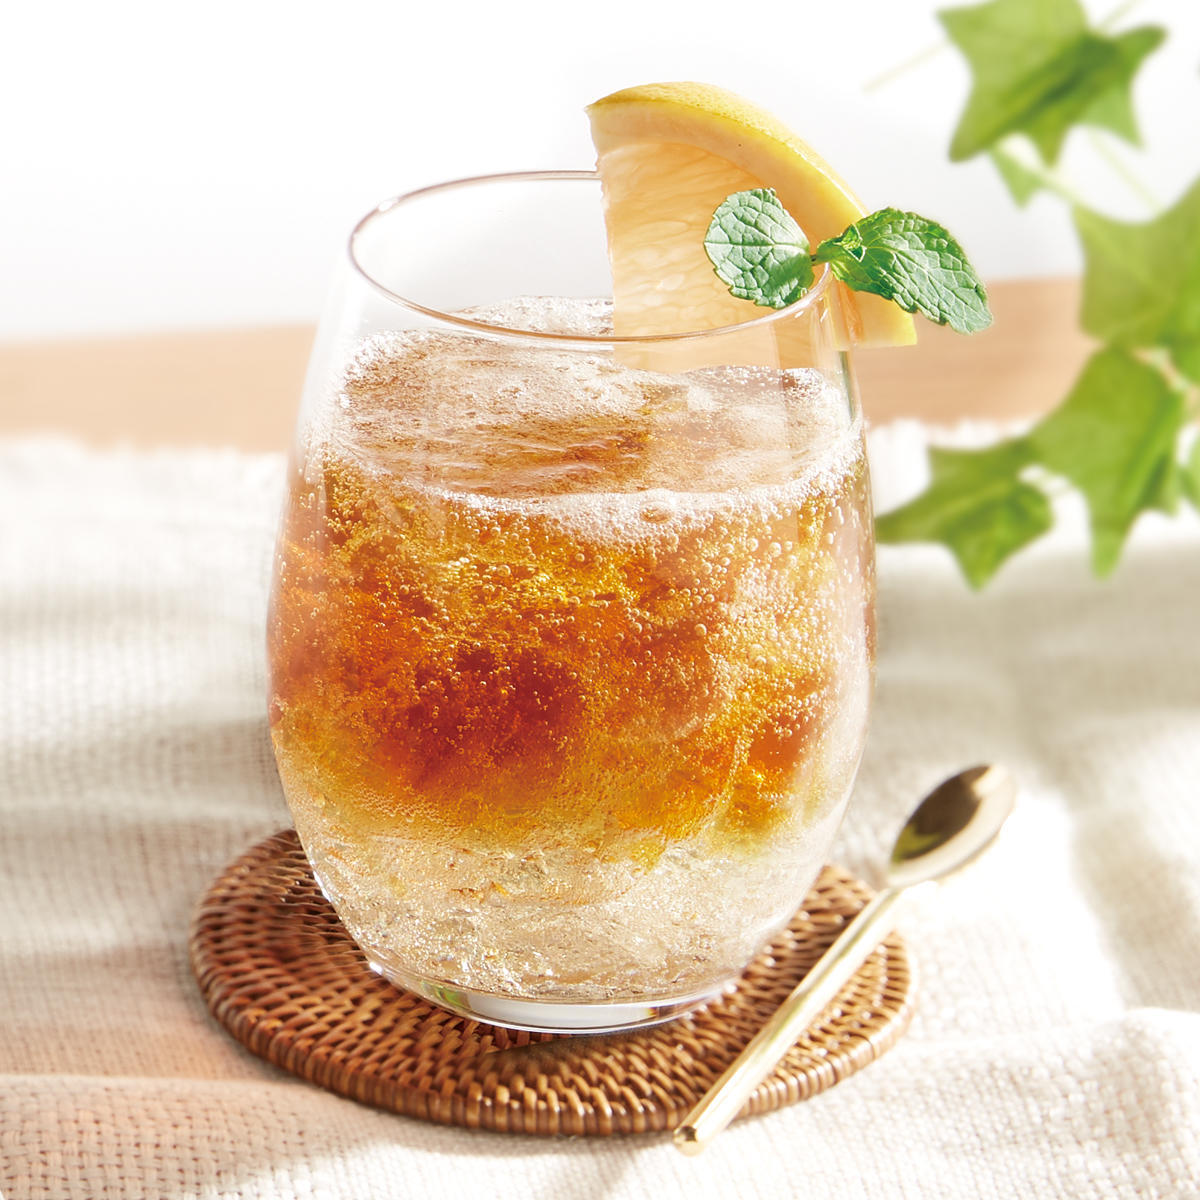 icedcoffee2020_7.jpg